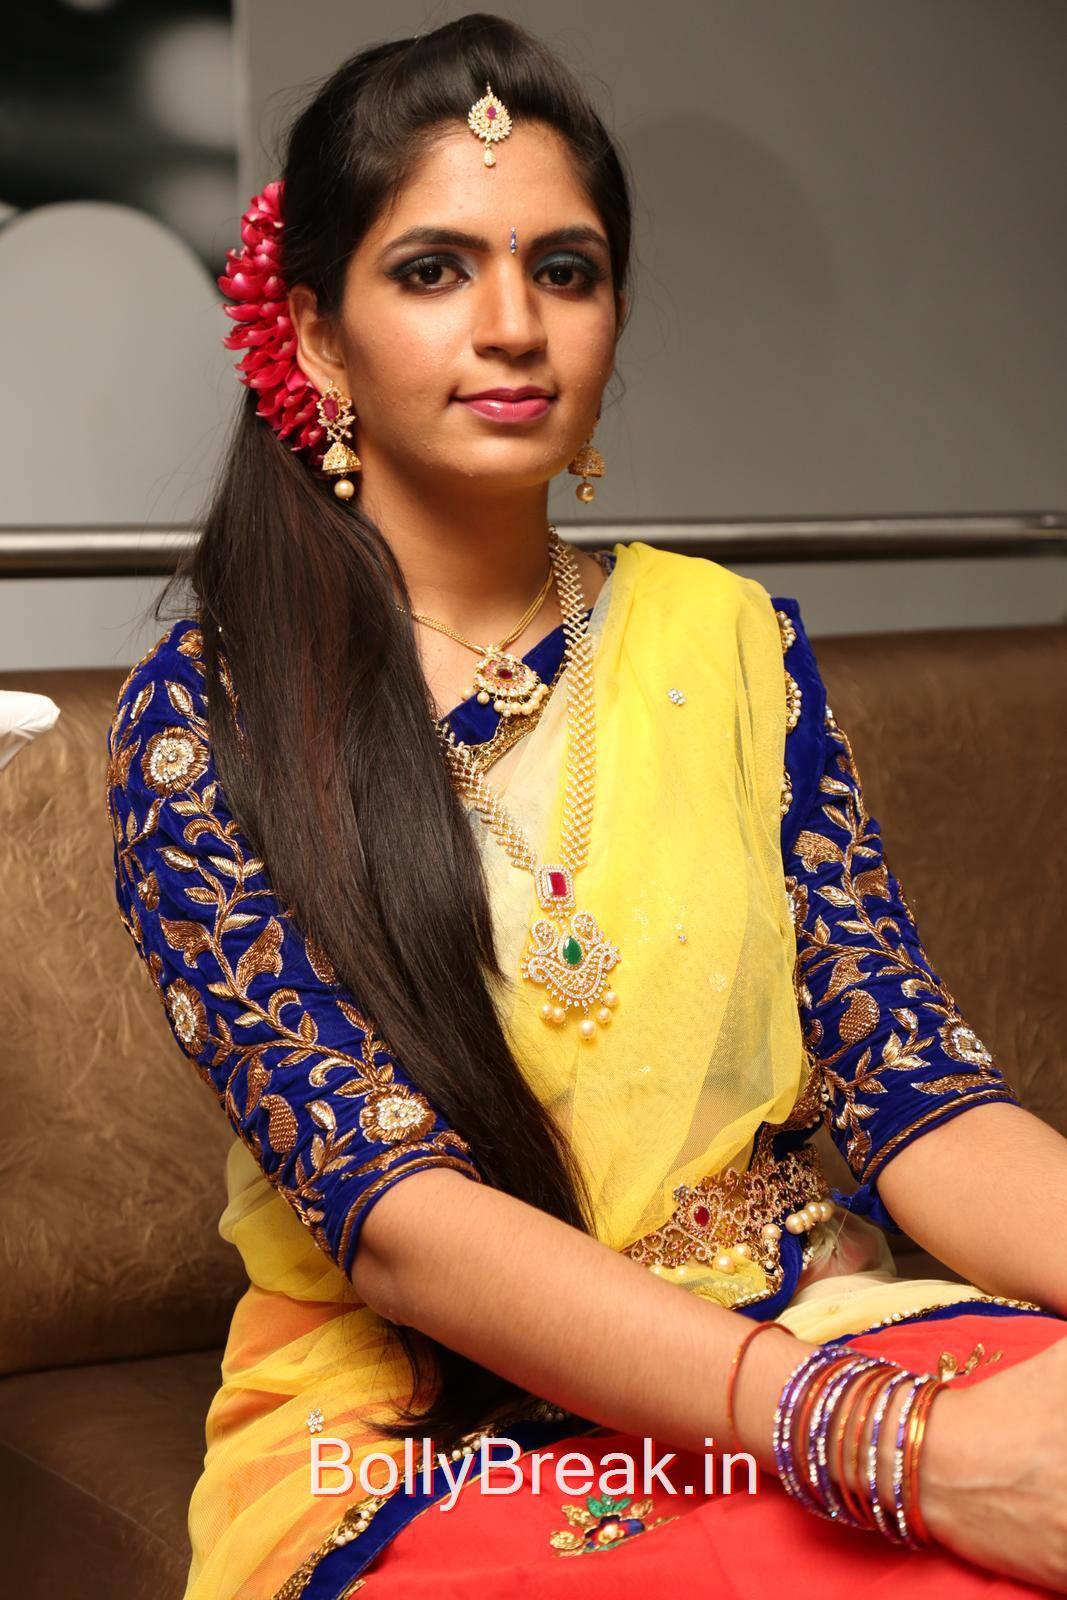 Tollywood Actress Anusha, Anusha Hot Pics from Bridal Dream Make up At Lakme Salon